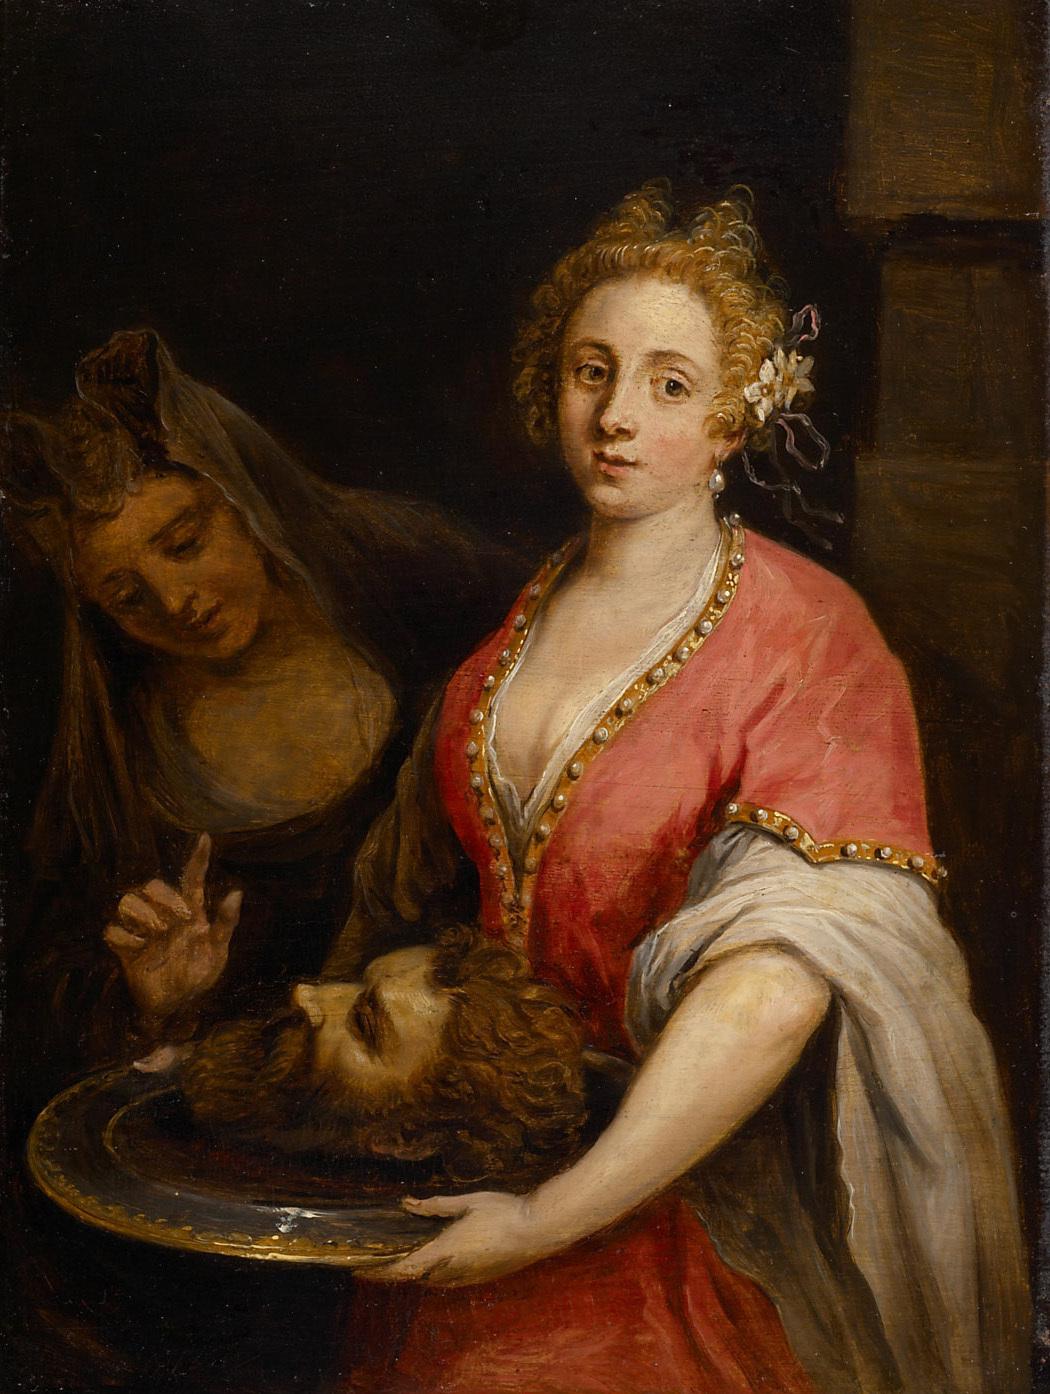 Salome mit dem Haupt Johannes des Täufers von David Teniers d. J.